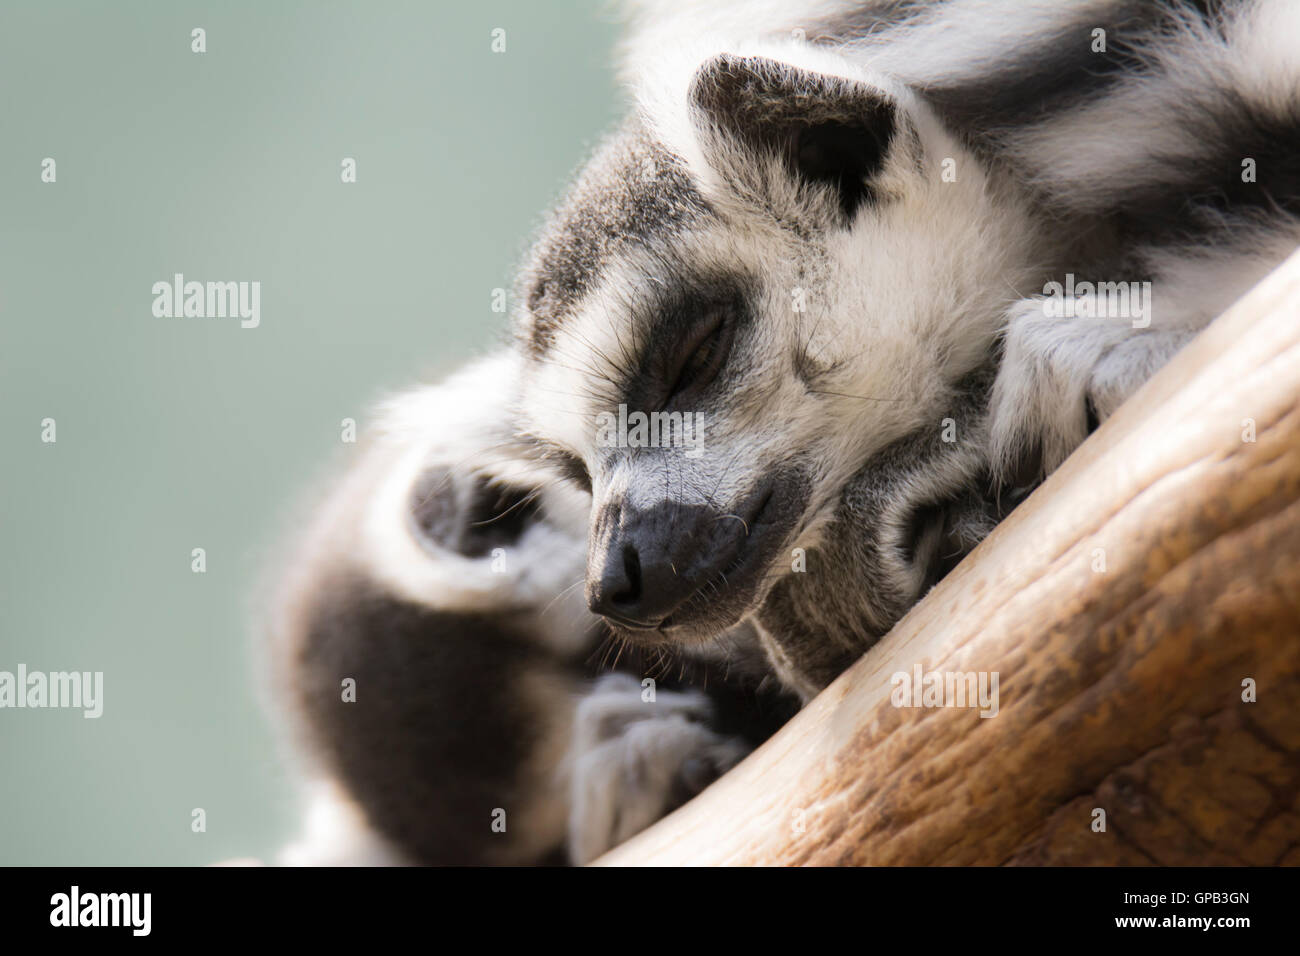 Closeup of dozing lemur cattas - Stock Image